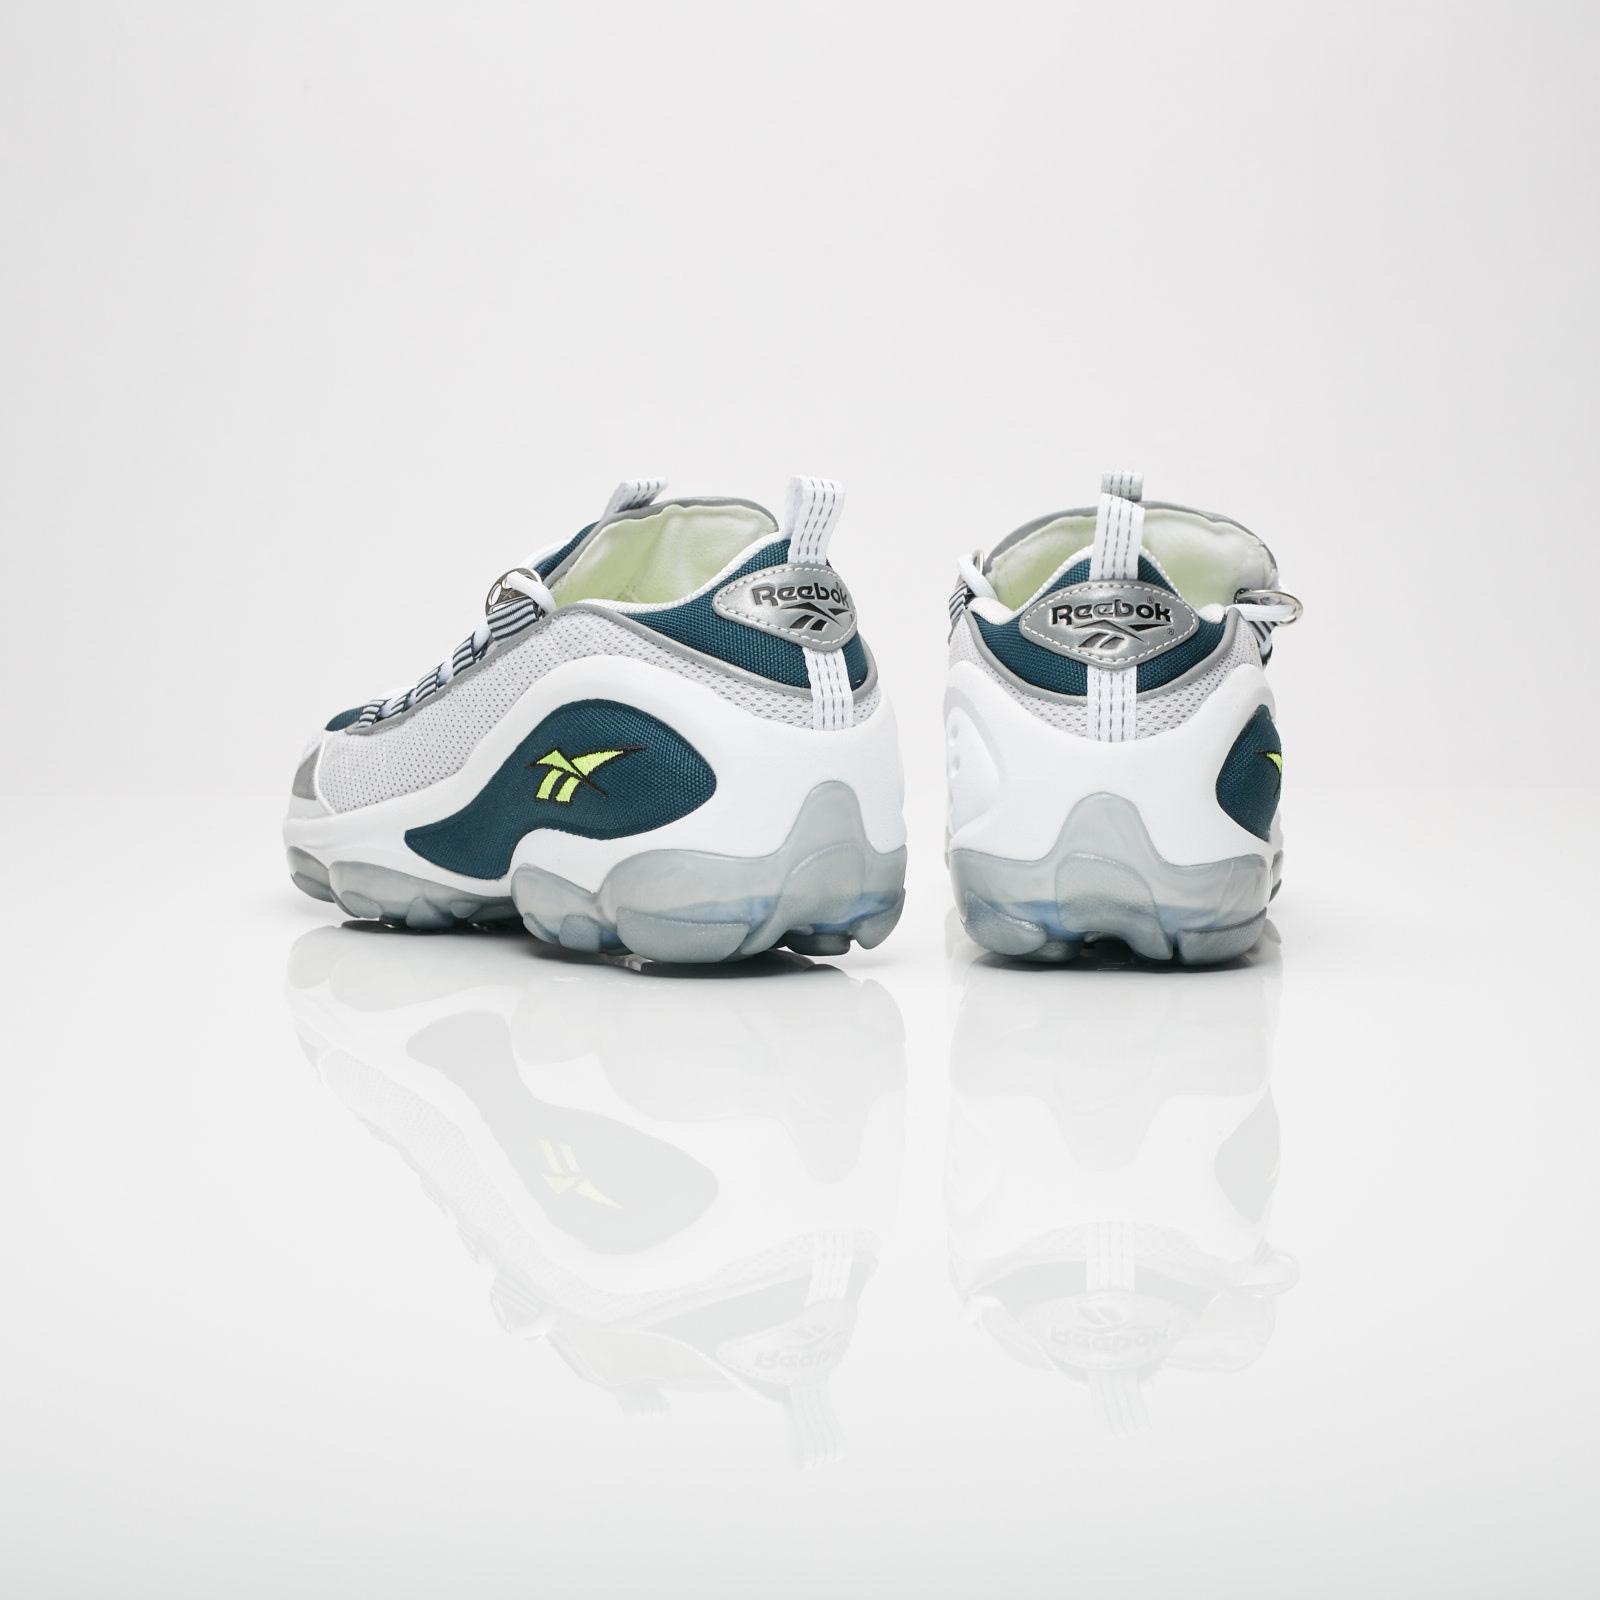 5b0e3b77121 Reebok DMX Run 10 - V44398 - Sneakersnstuff